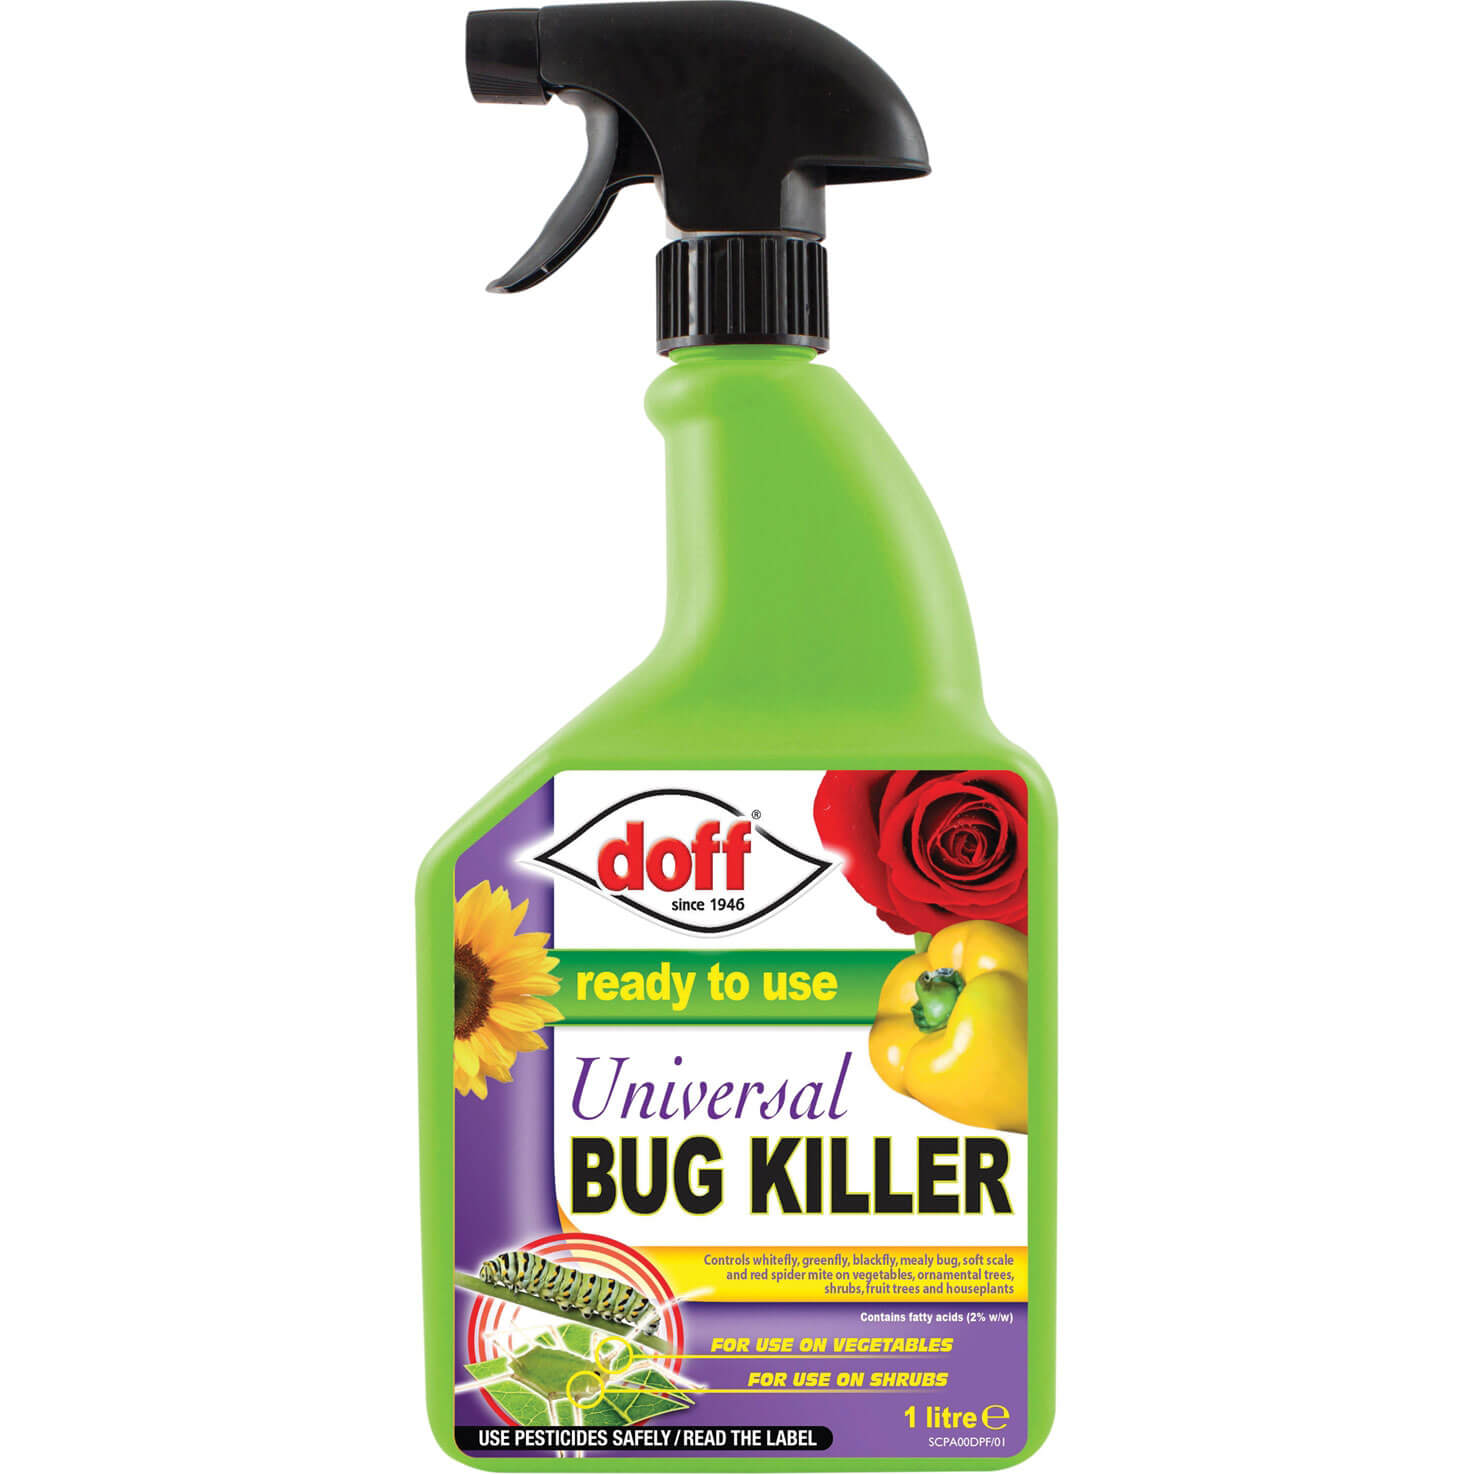 Image of Doff Universal Bug Killer 1l